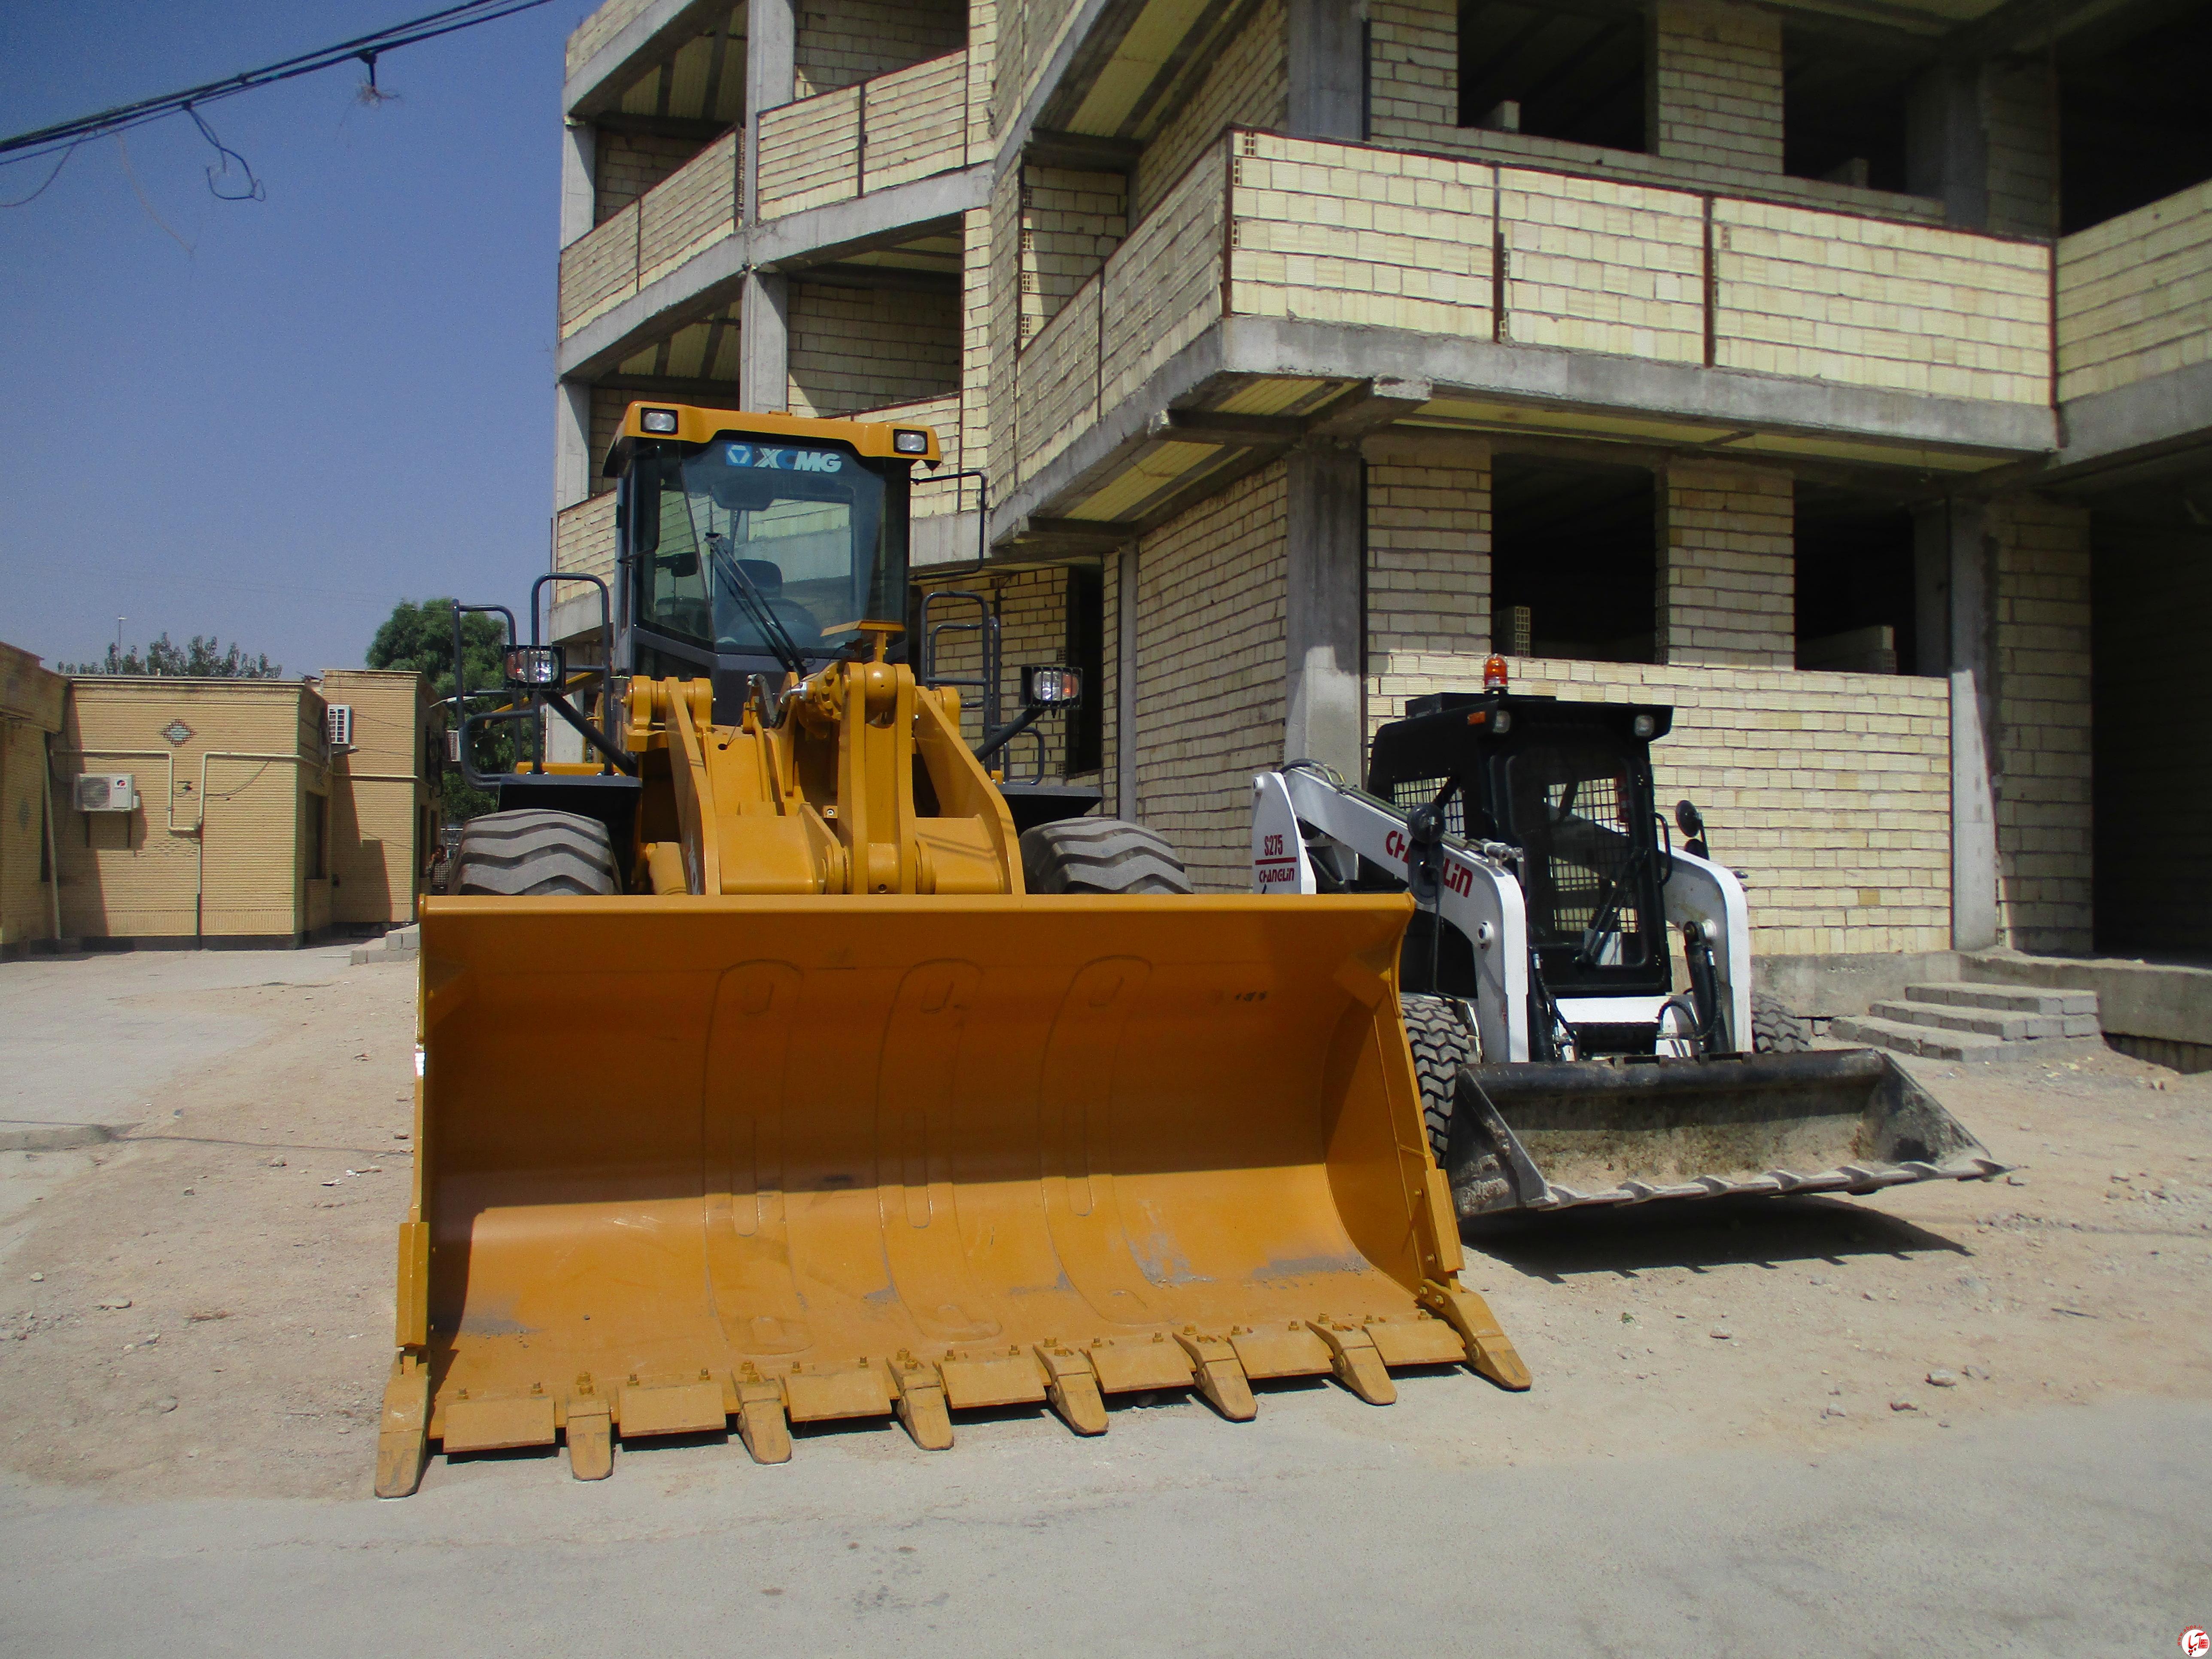 IMG_1505 اضاف شدن یک دستگاه لودر zl50 و یک دستگاه مینی لودر به ناوگان شهرداری فیروزآباد